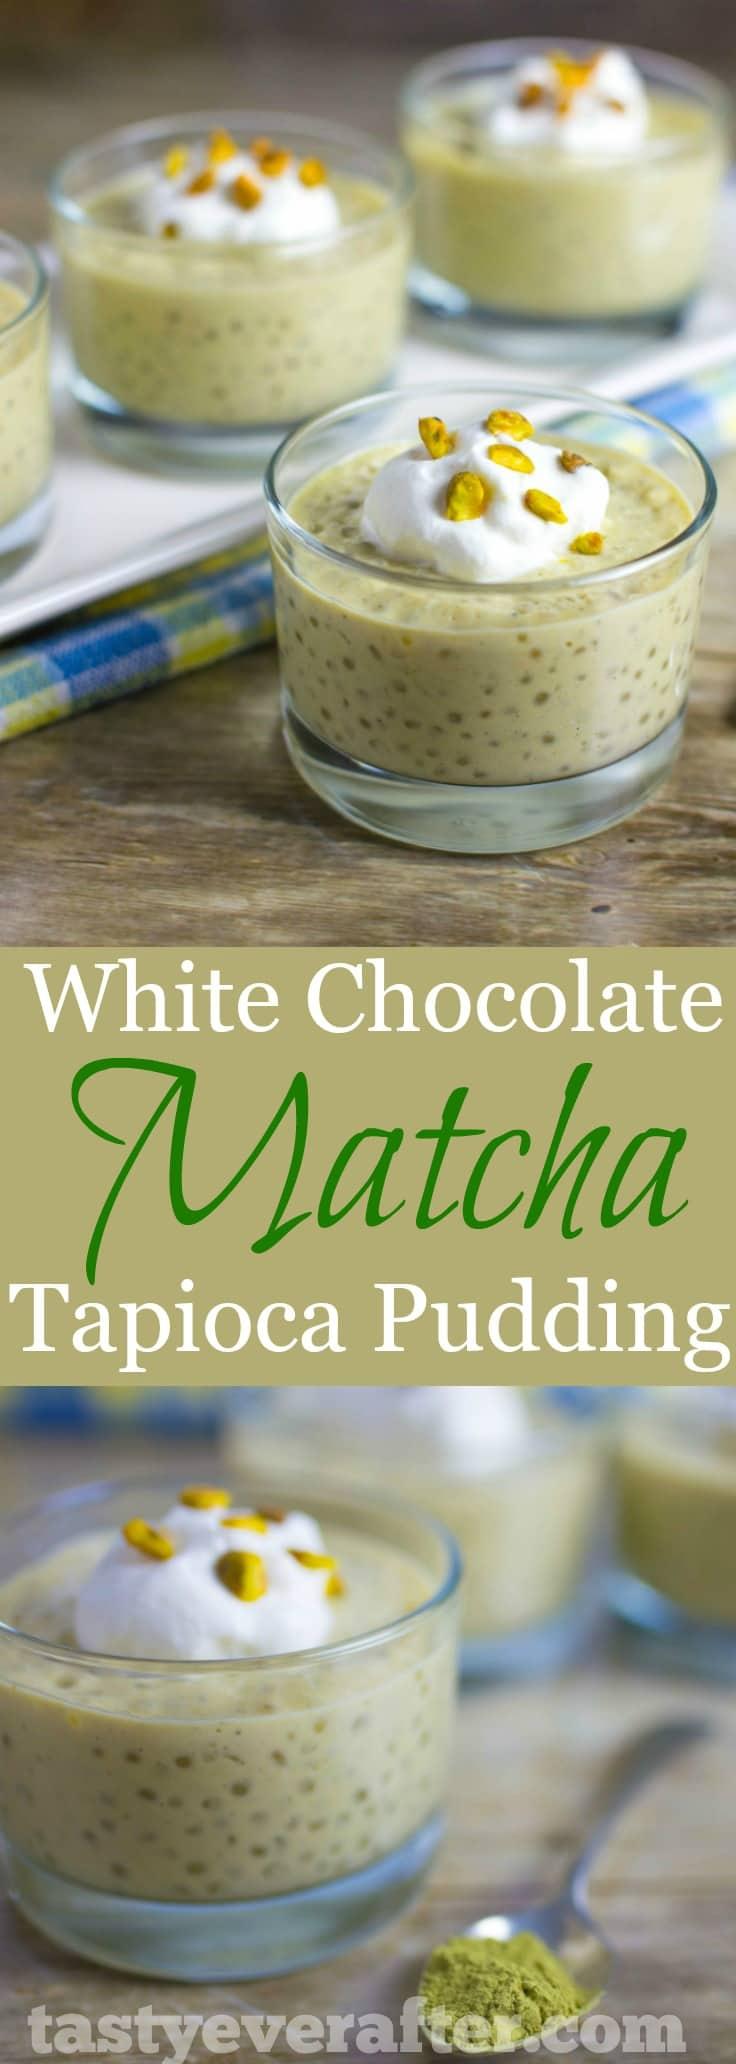 White Chocolate Matcha Tapioca Pudding Recipe